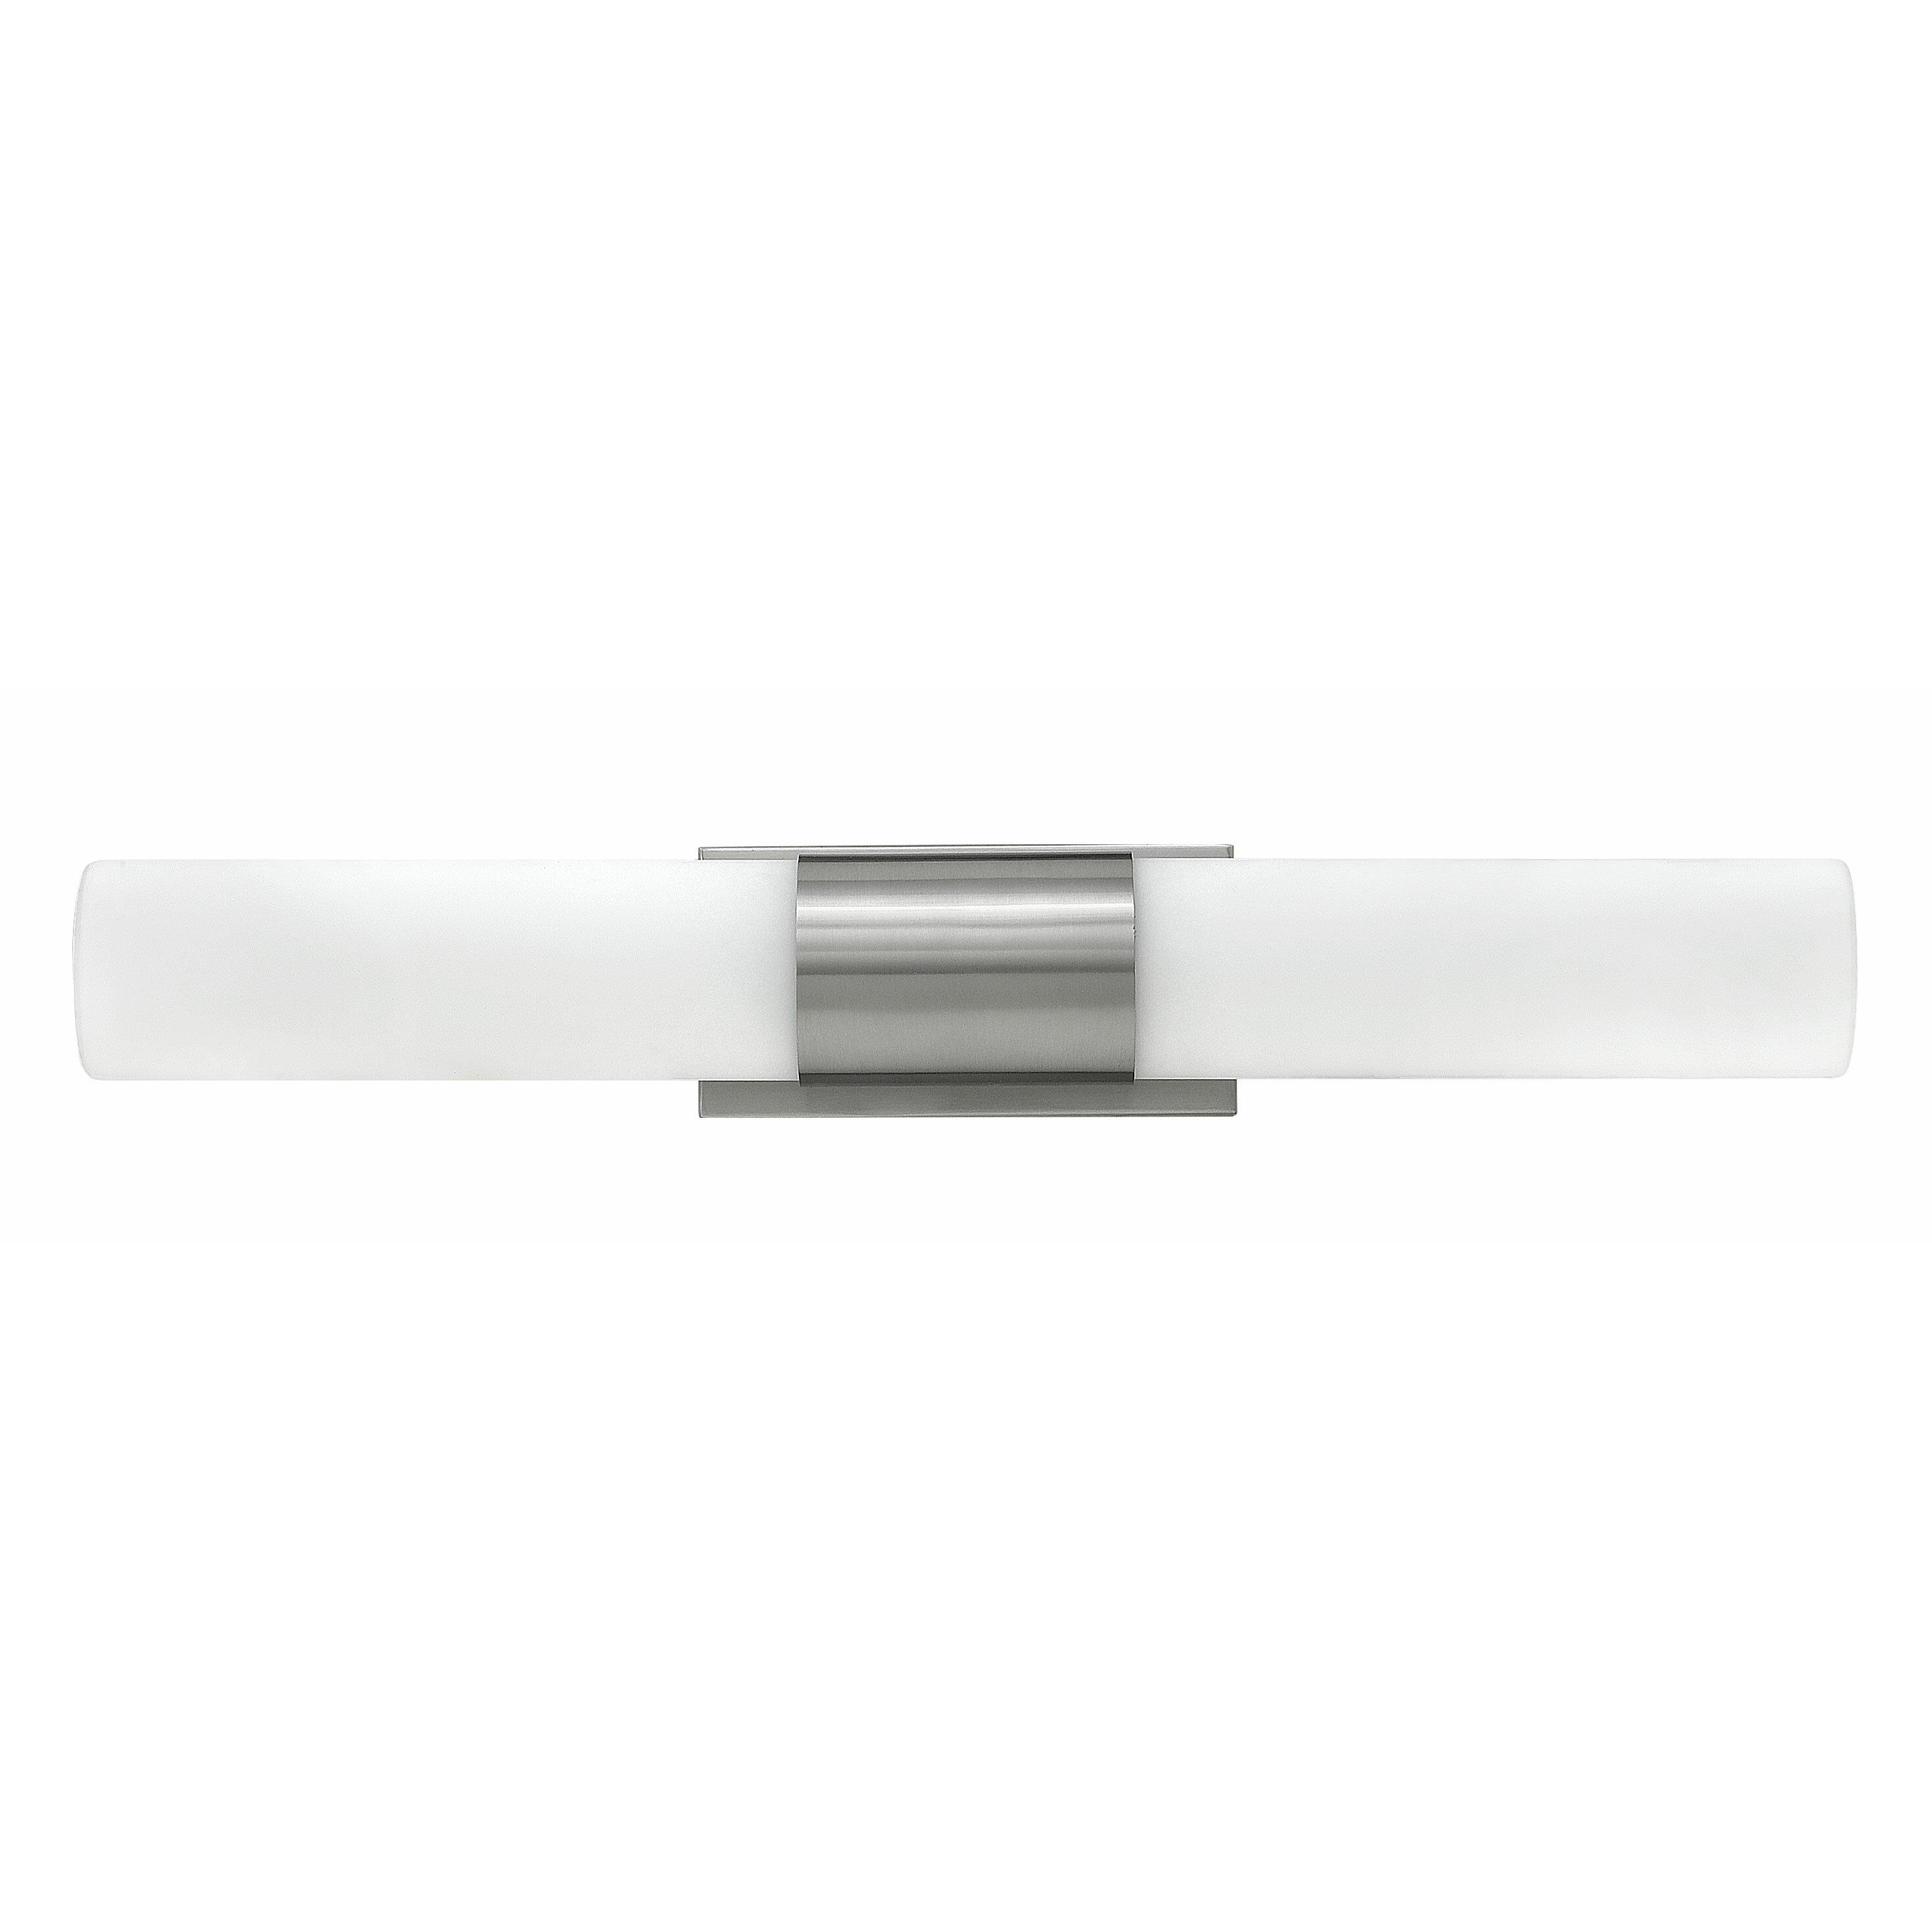 Hinkley Lighting Portia 1 Light Bath Bar & Reviews